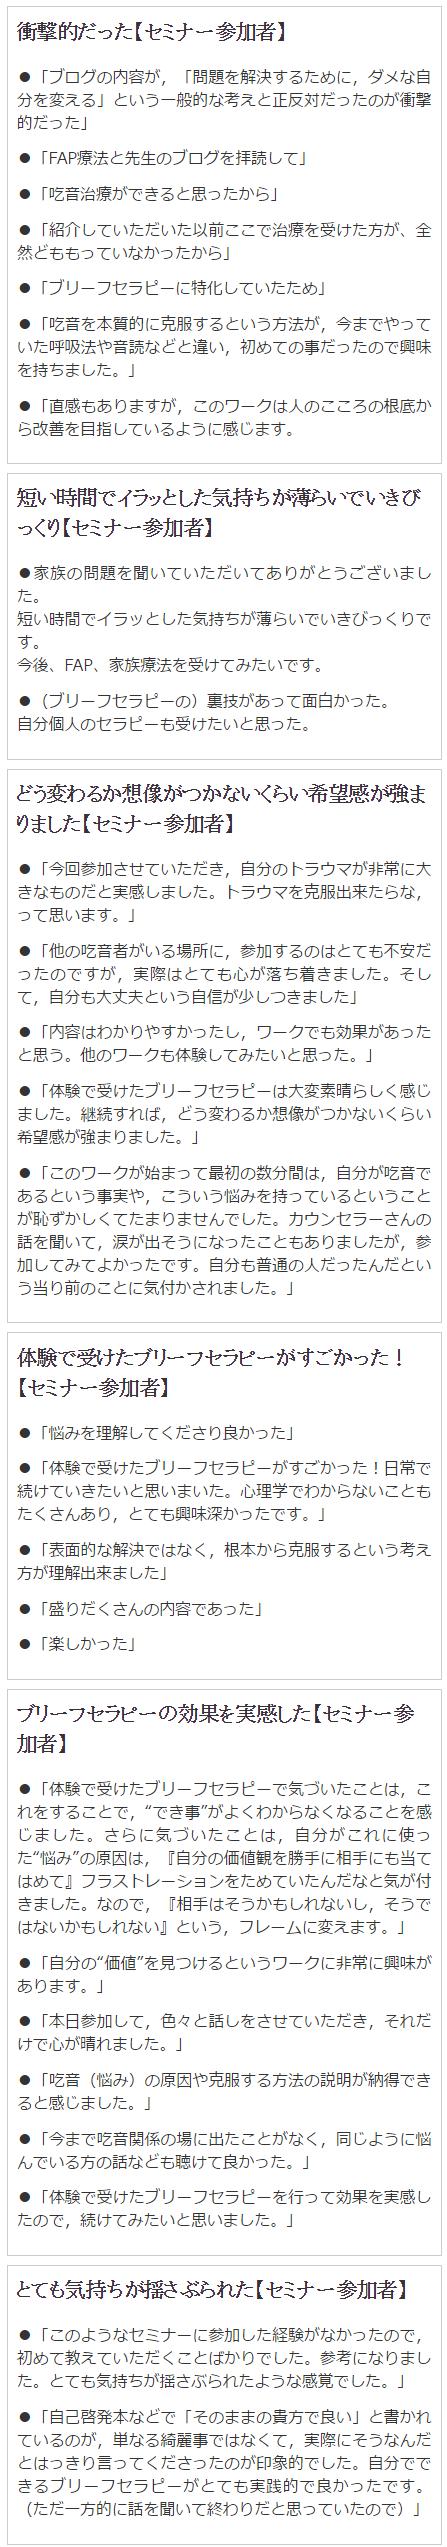 screenshot_251